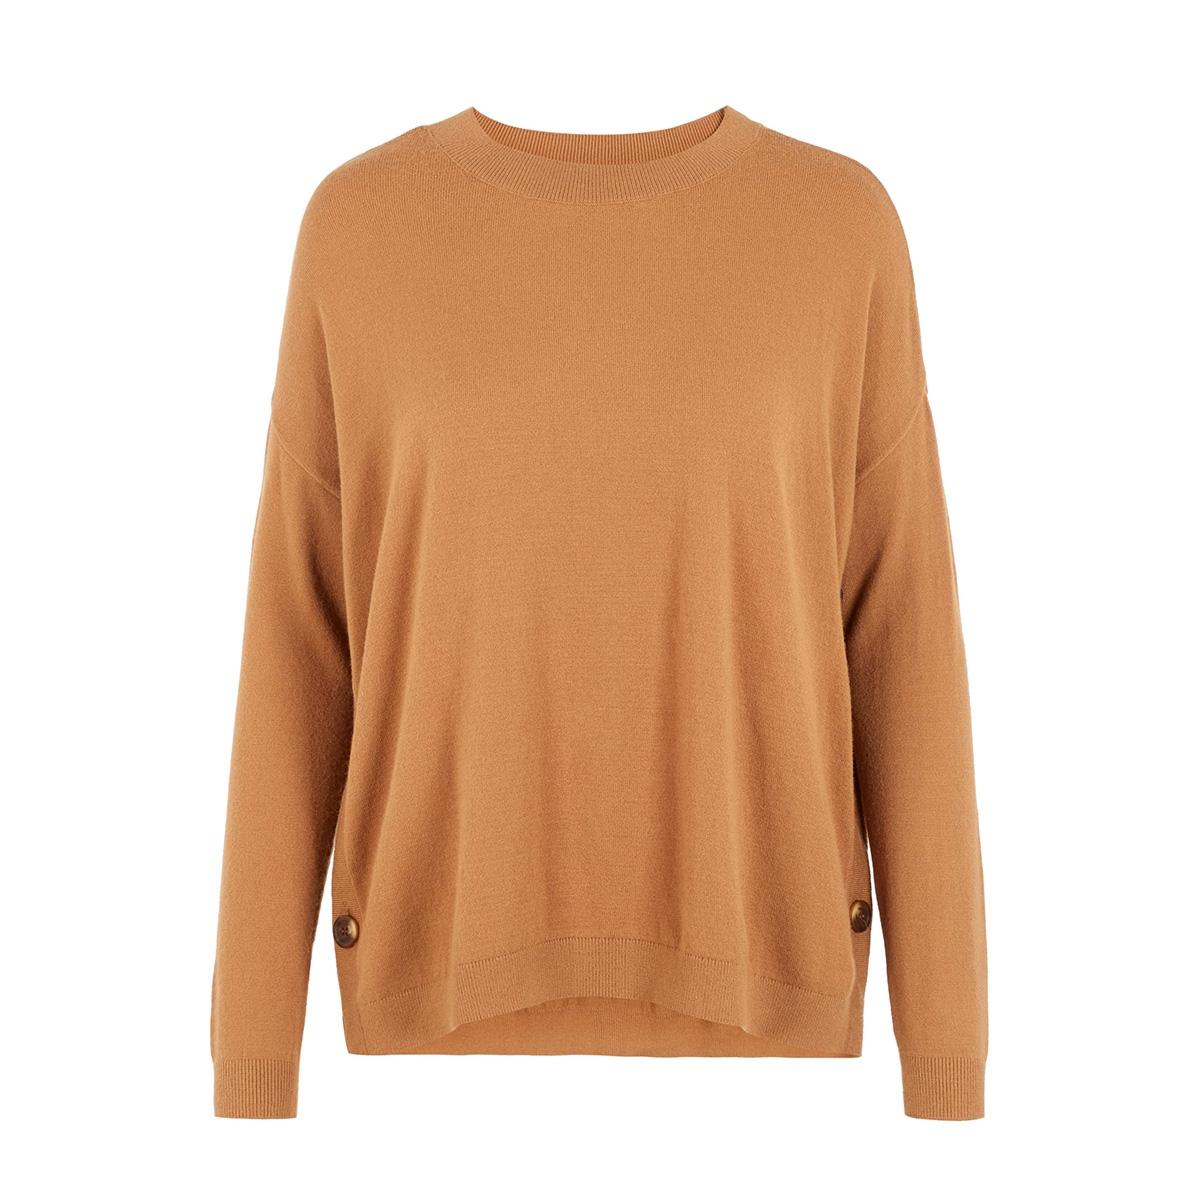 vmchou karis ls o-neck button blous 10215206 vero moda trui tobacco brown